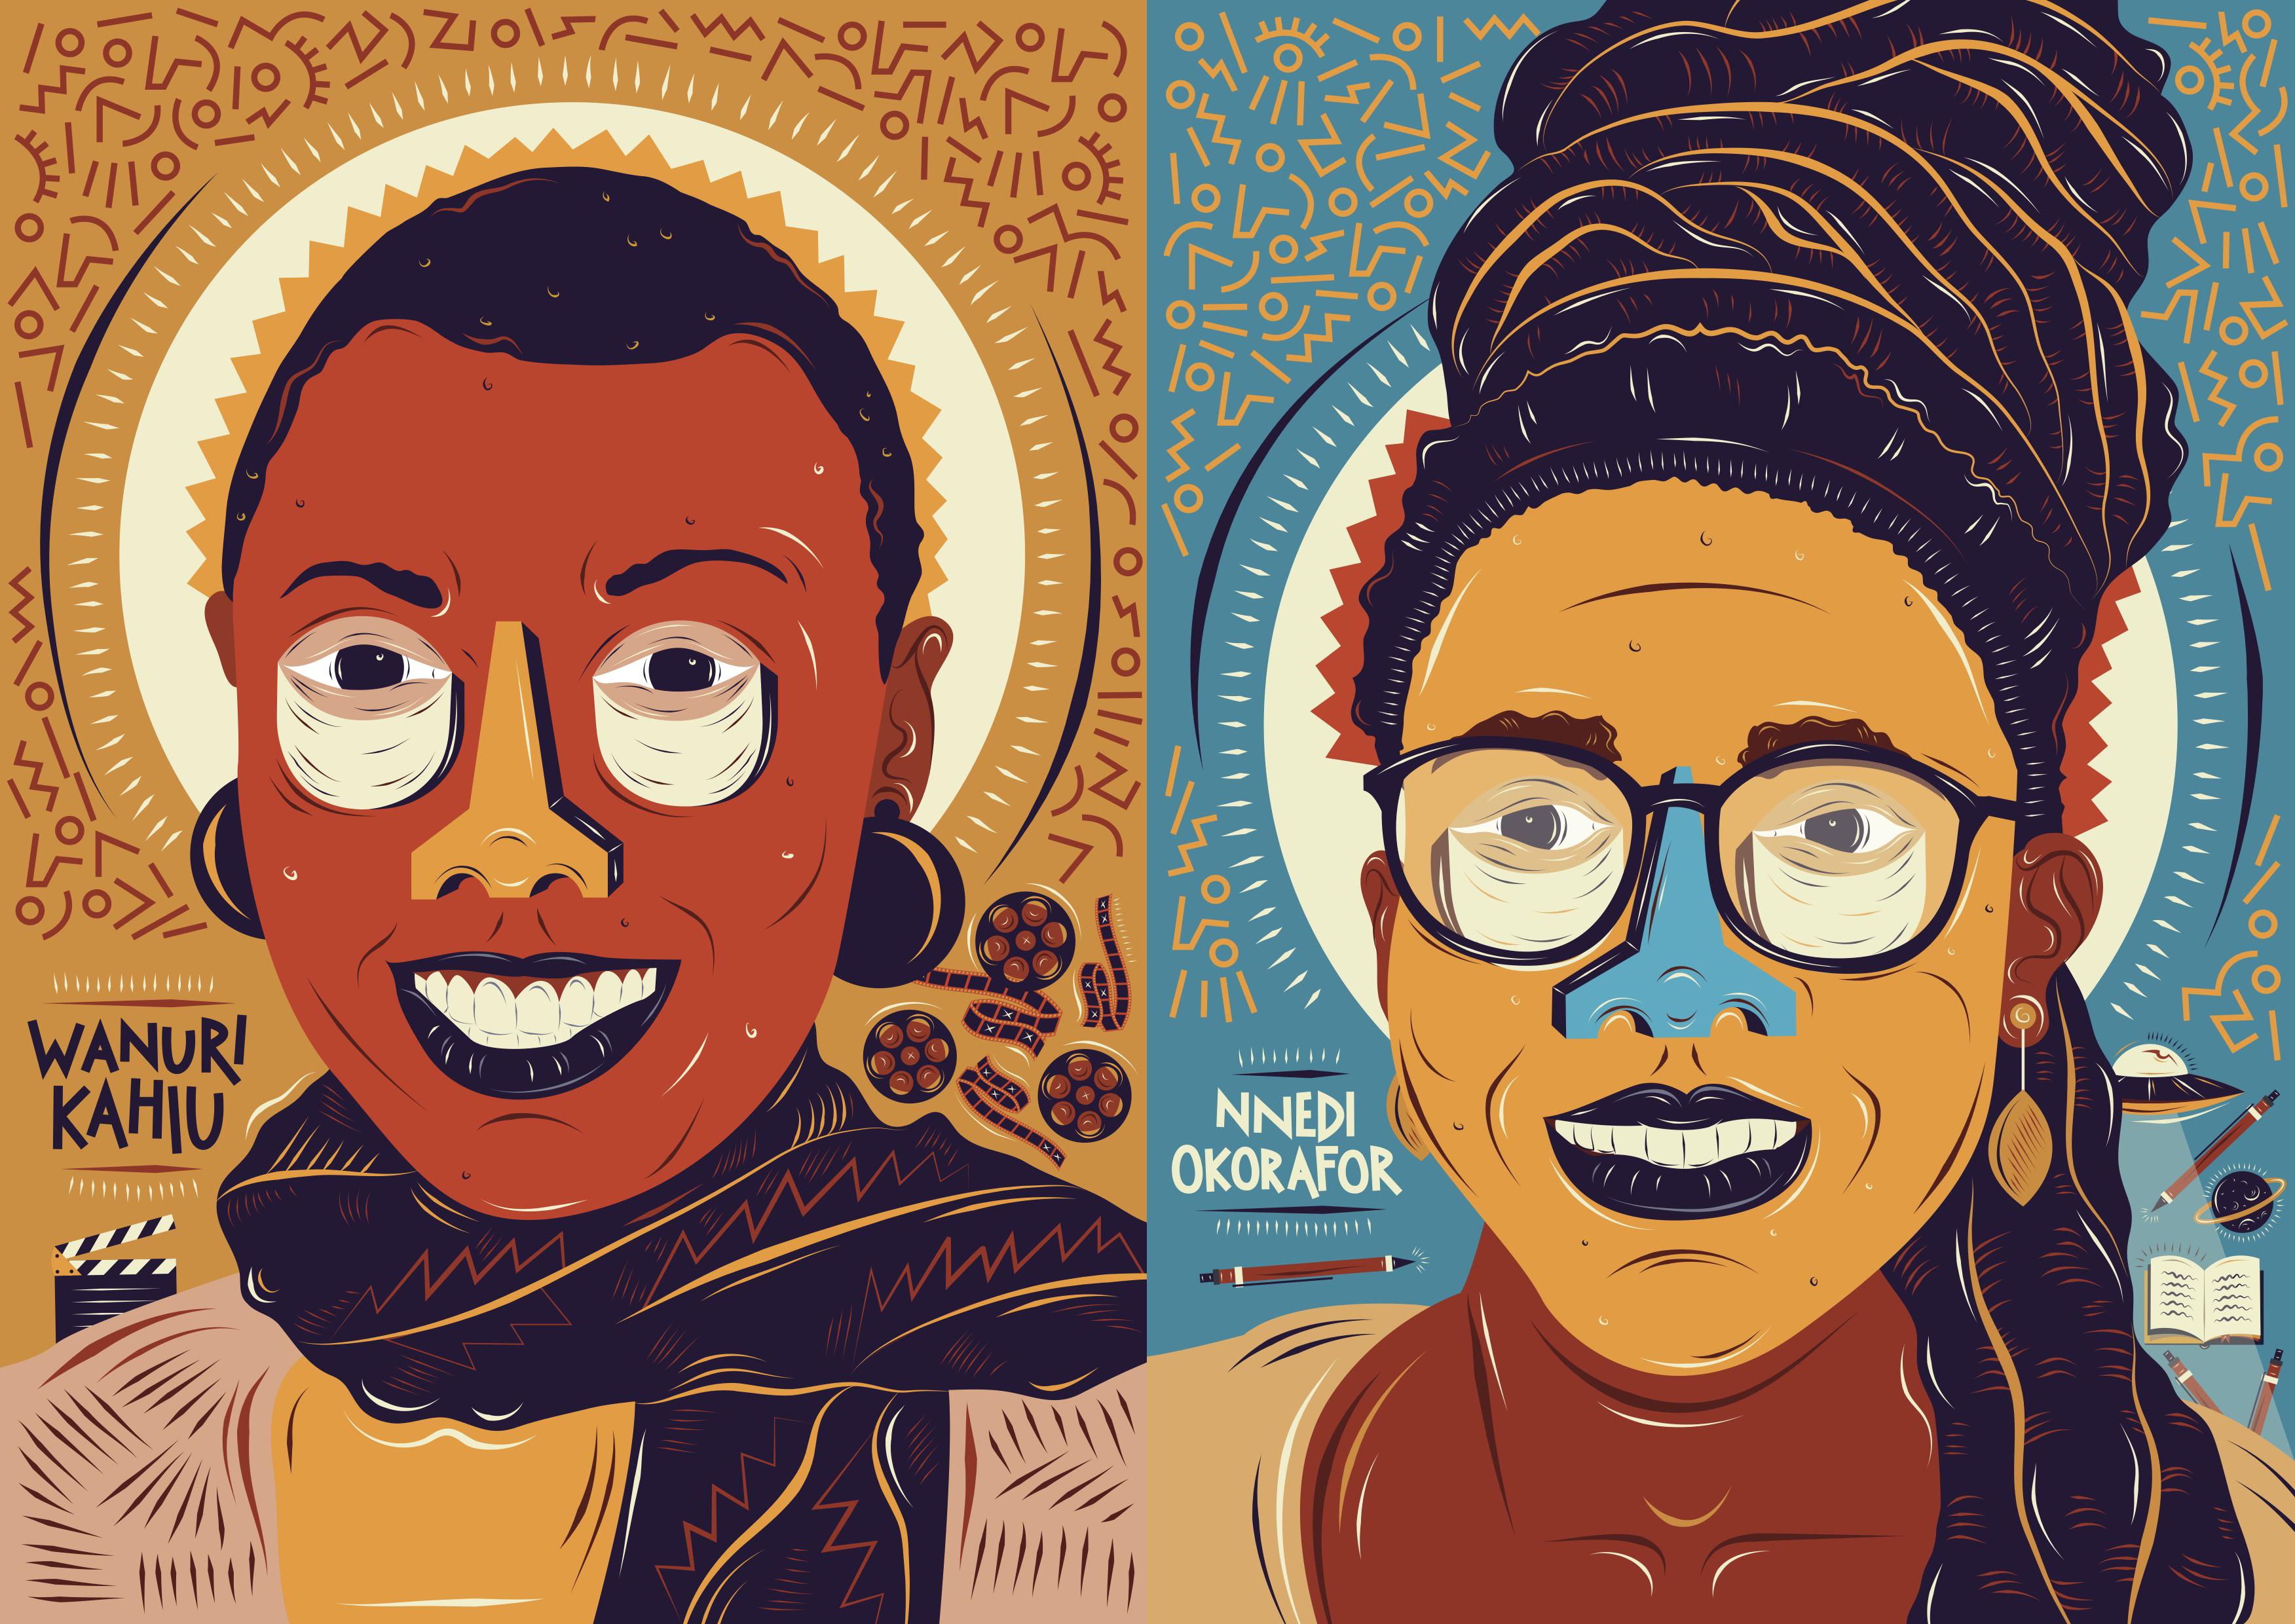 Wanuri Kahiu and Nnedi Okoroafor (Karabo Moletsane for Quartz)